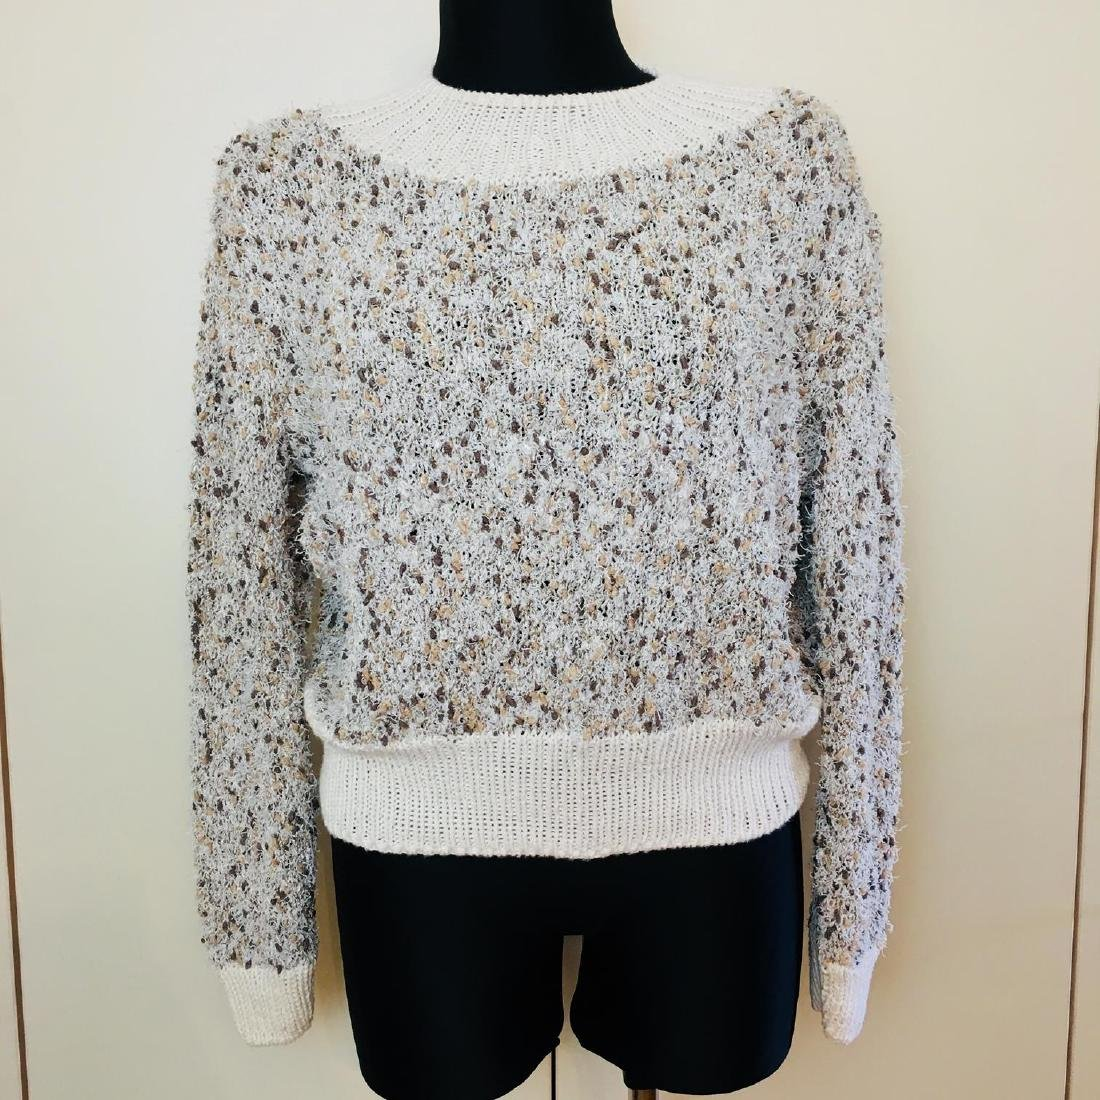 Vintage Women's Fluffy Sweater Jumper Size US 14